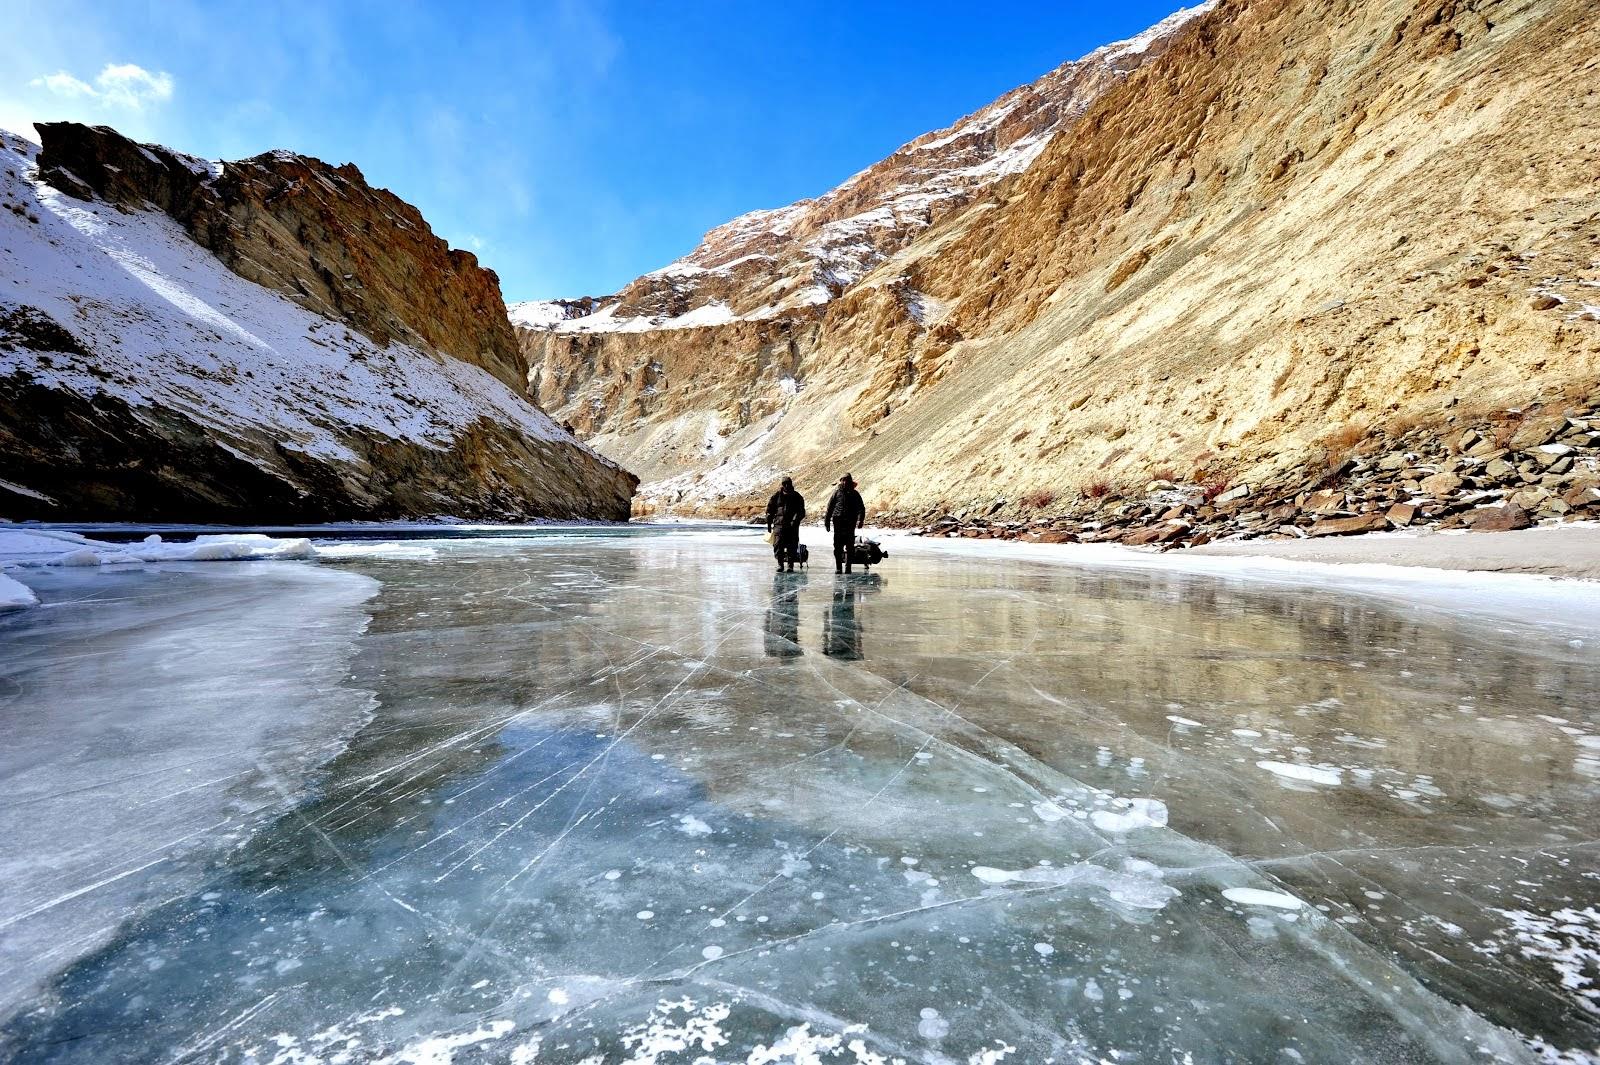 Ladakh Hd Wallpapers Fine Food